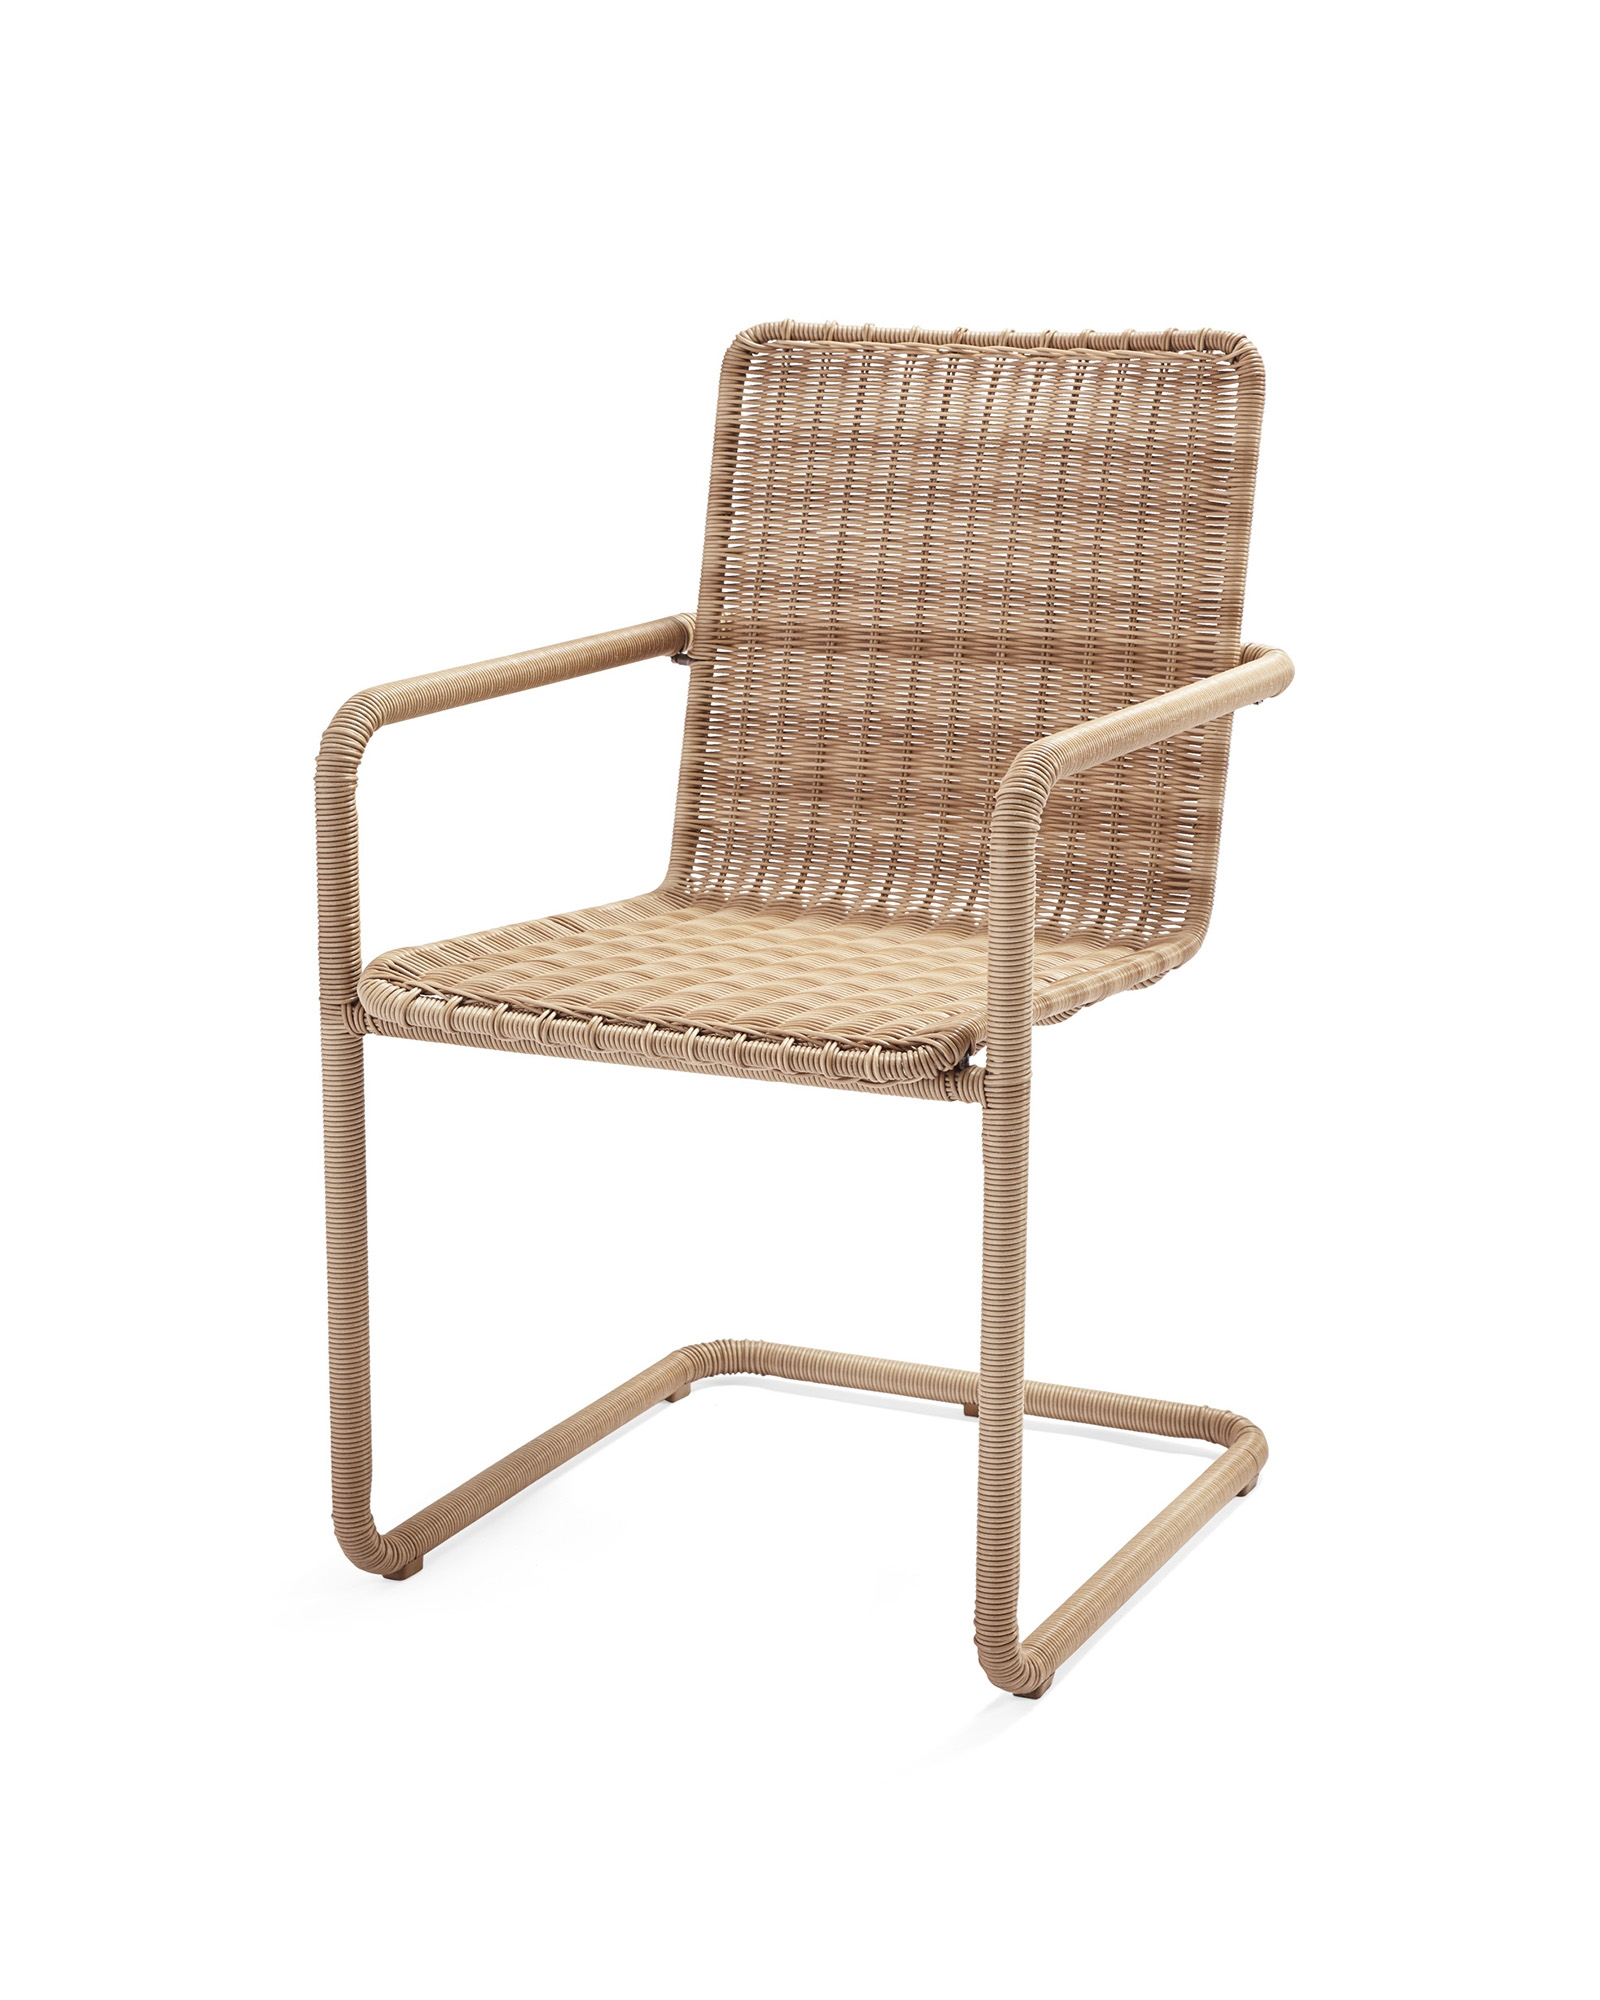 Furn_Hillside_Outdoor_Dining_Chair_Dune_Angle_MV_Crop_SH.jpg